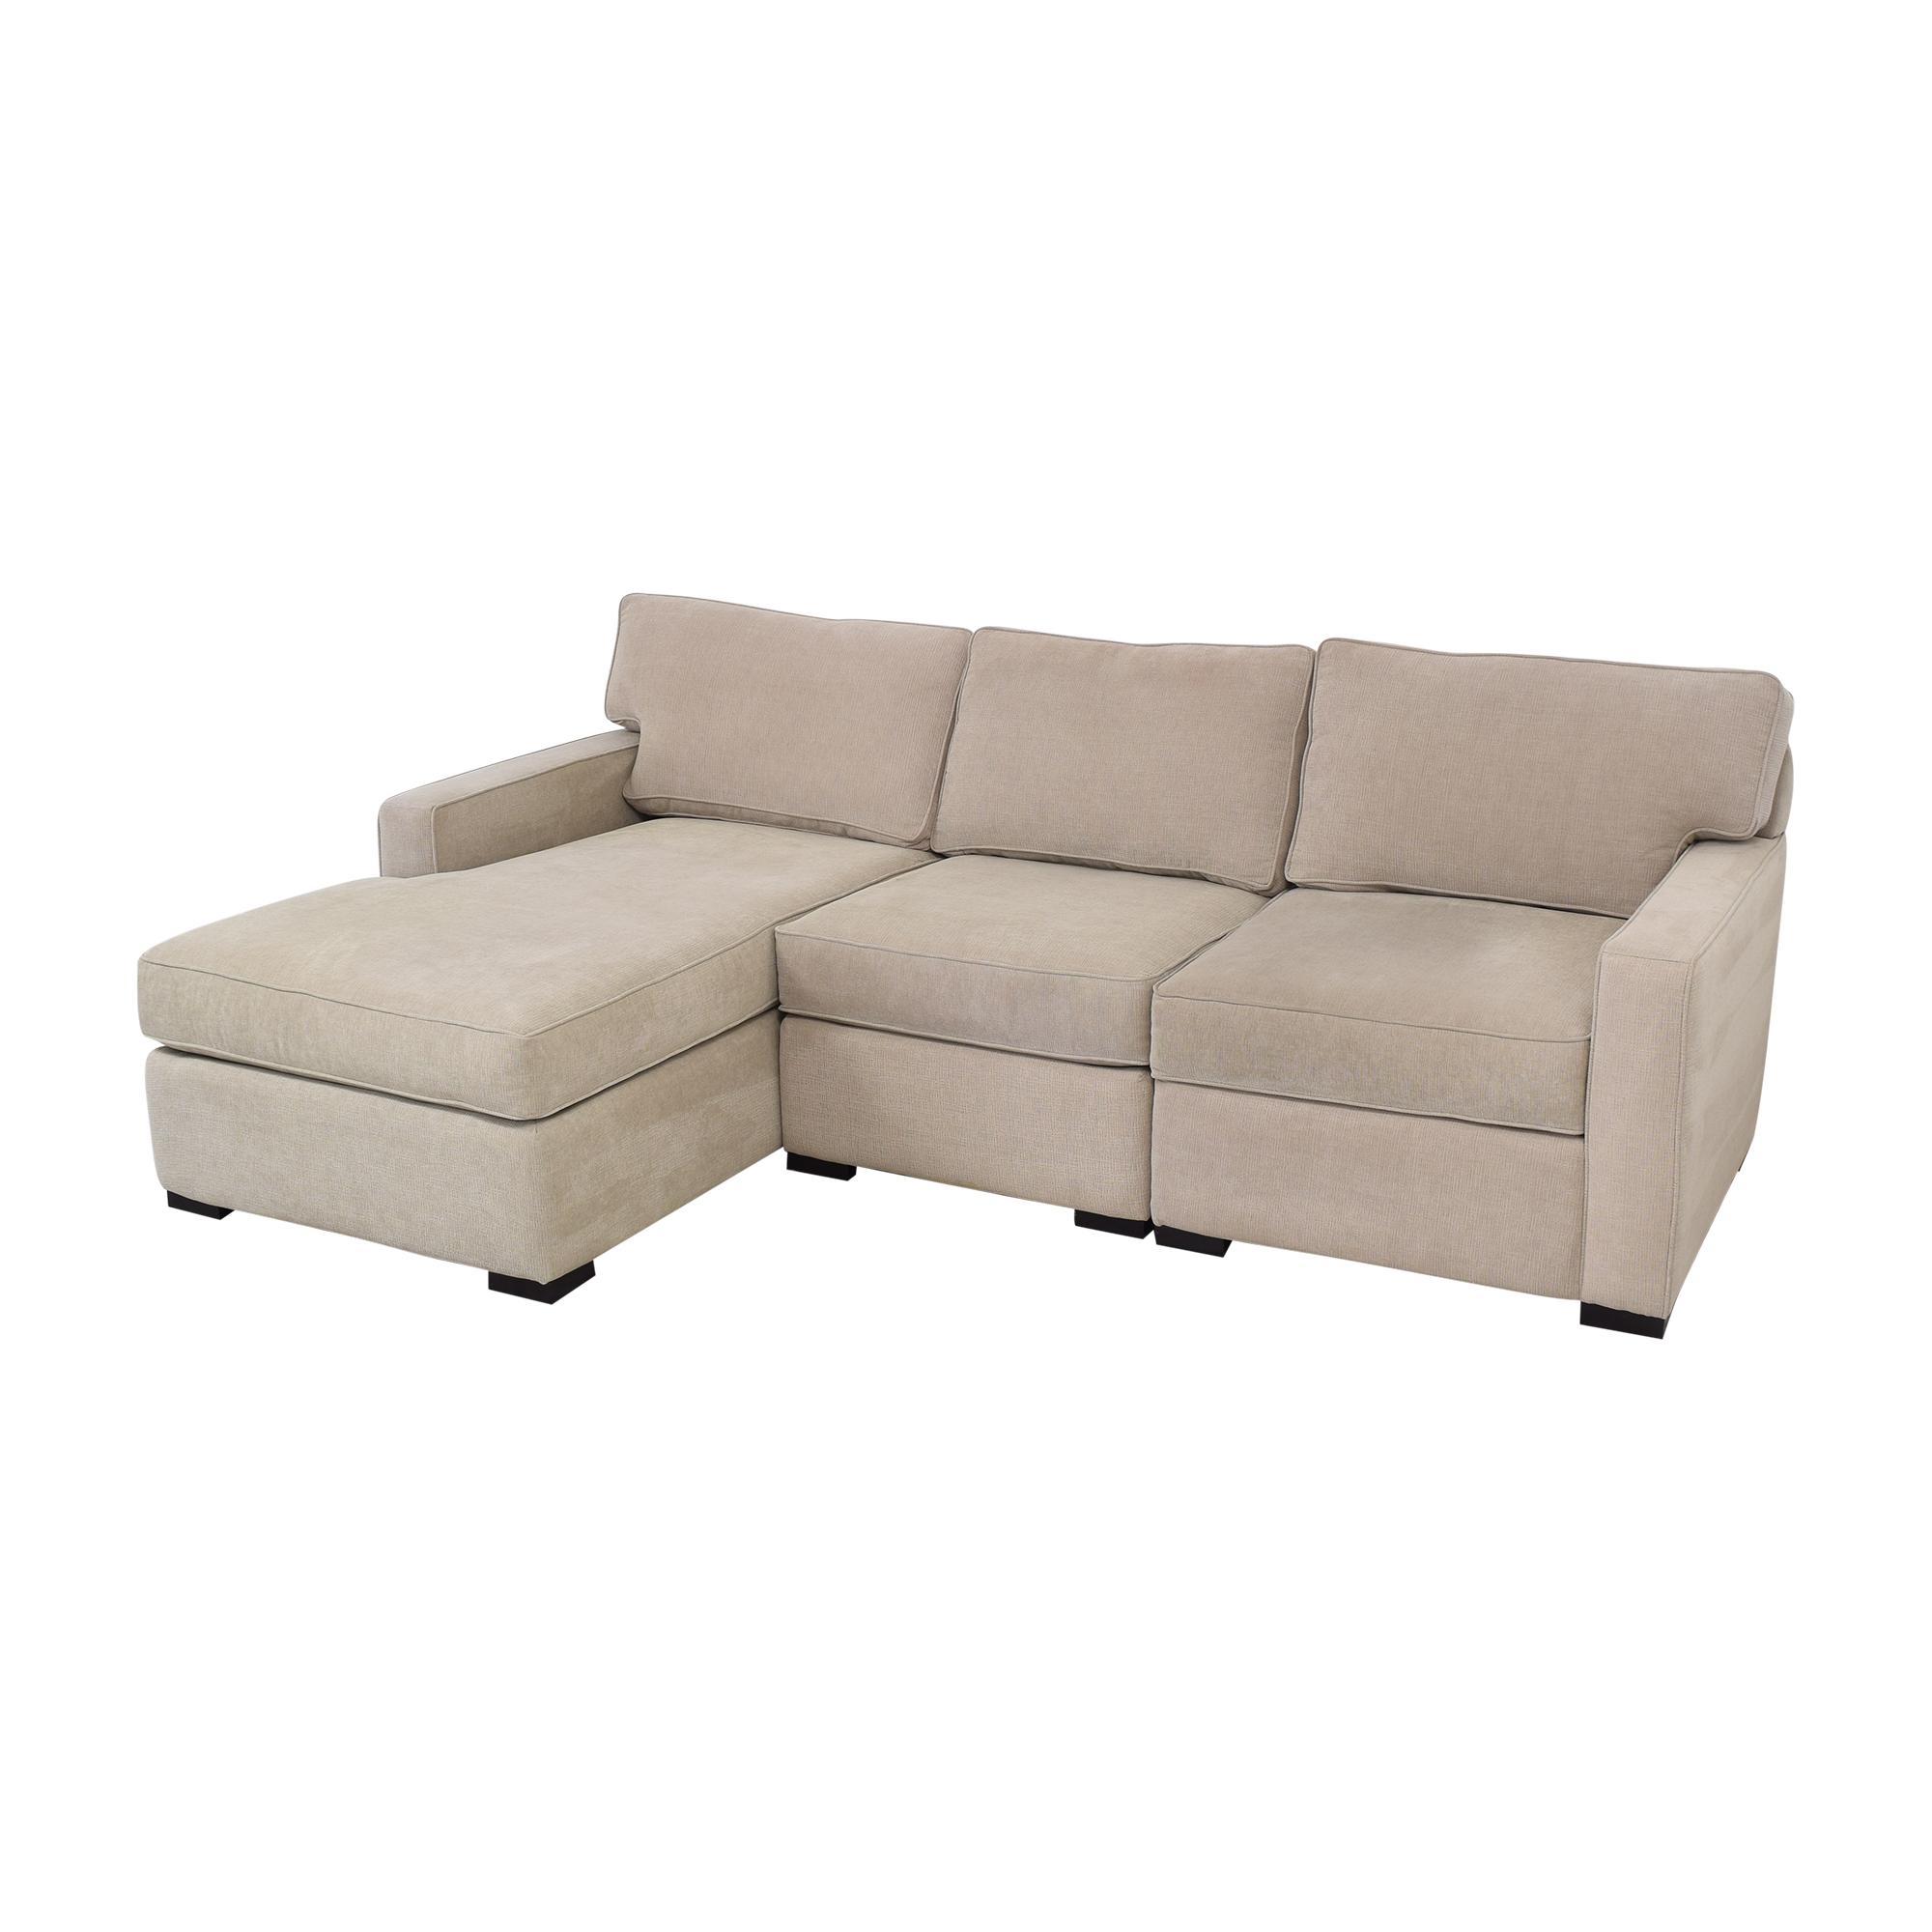 Macy's Macy's Chaise Sectional Sofa grey